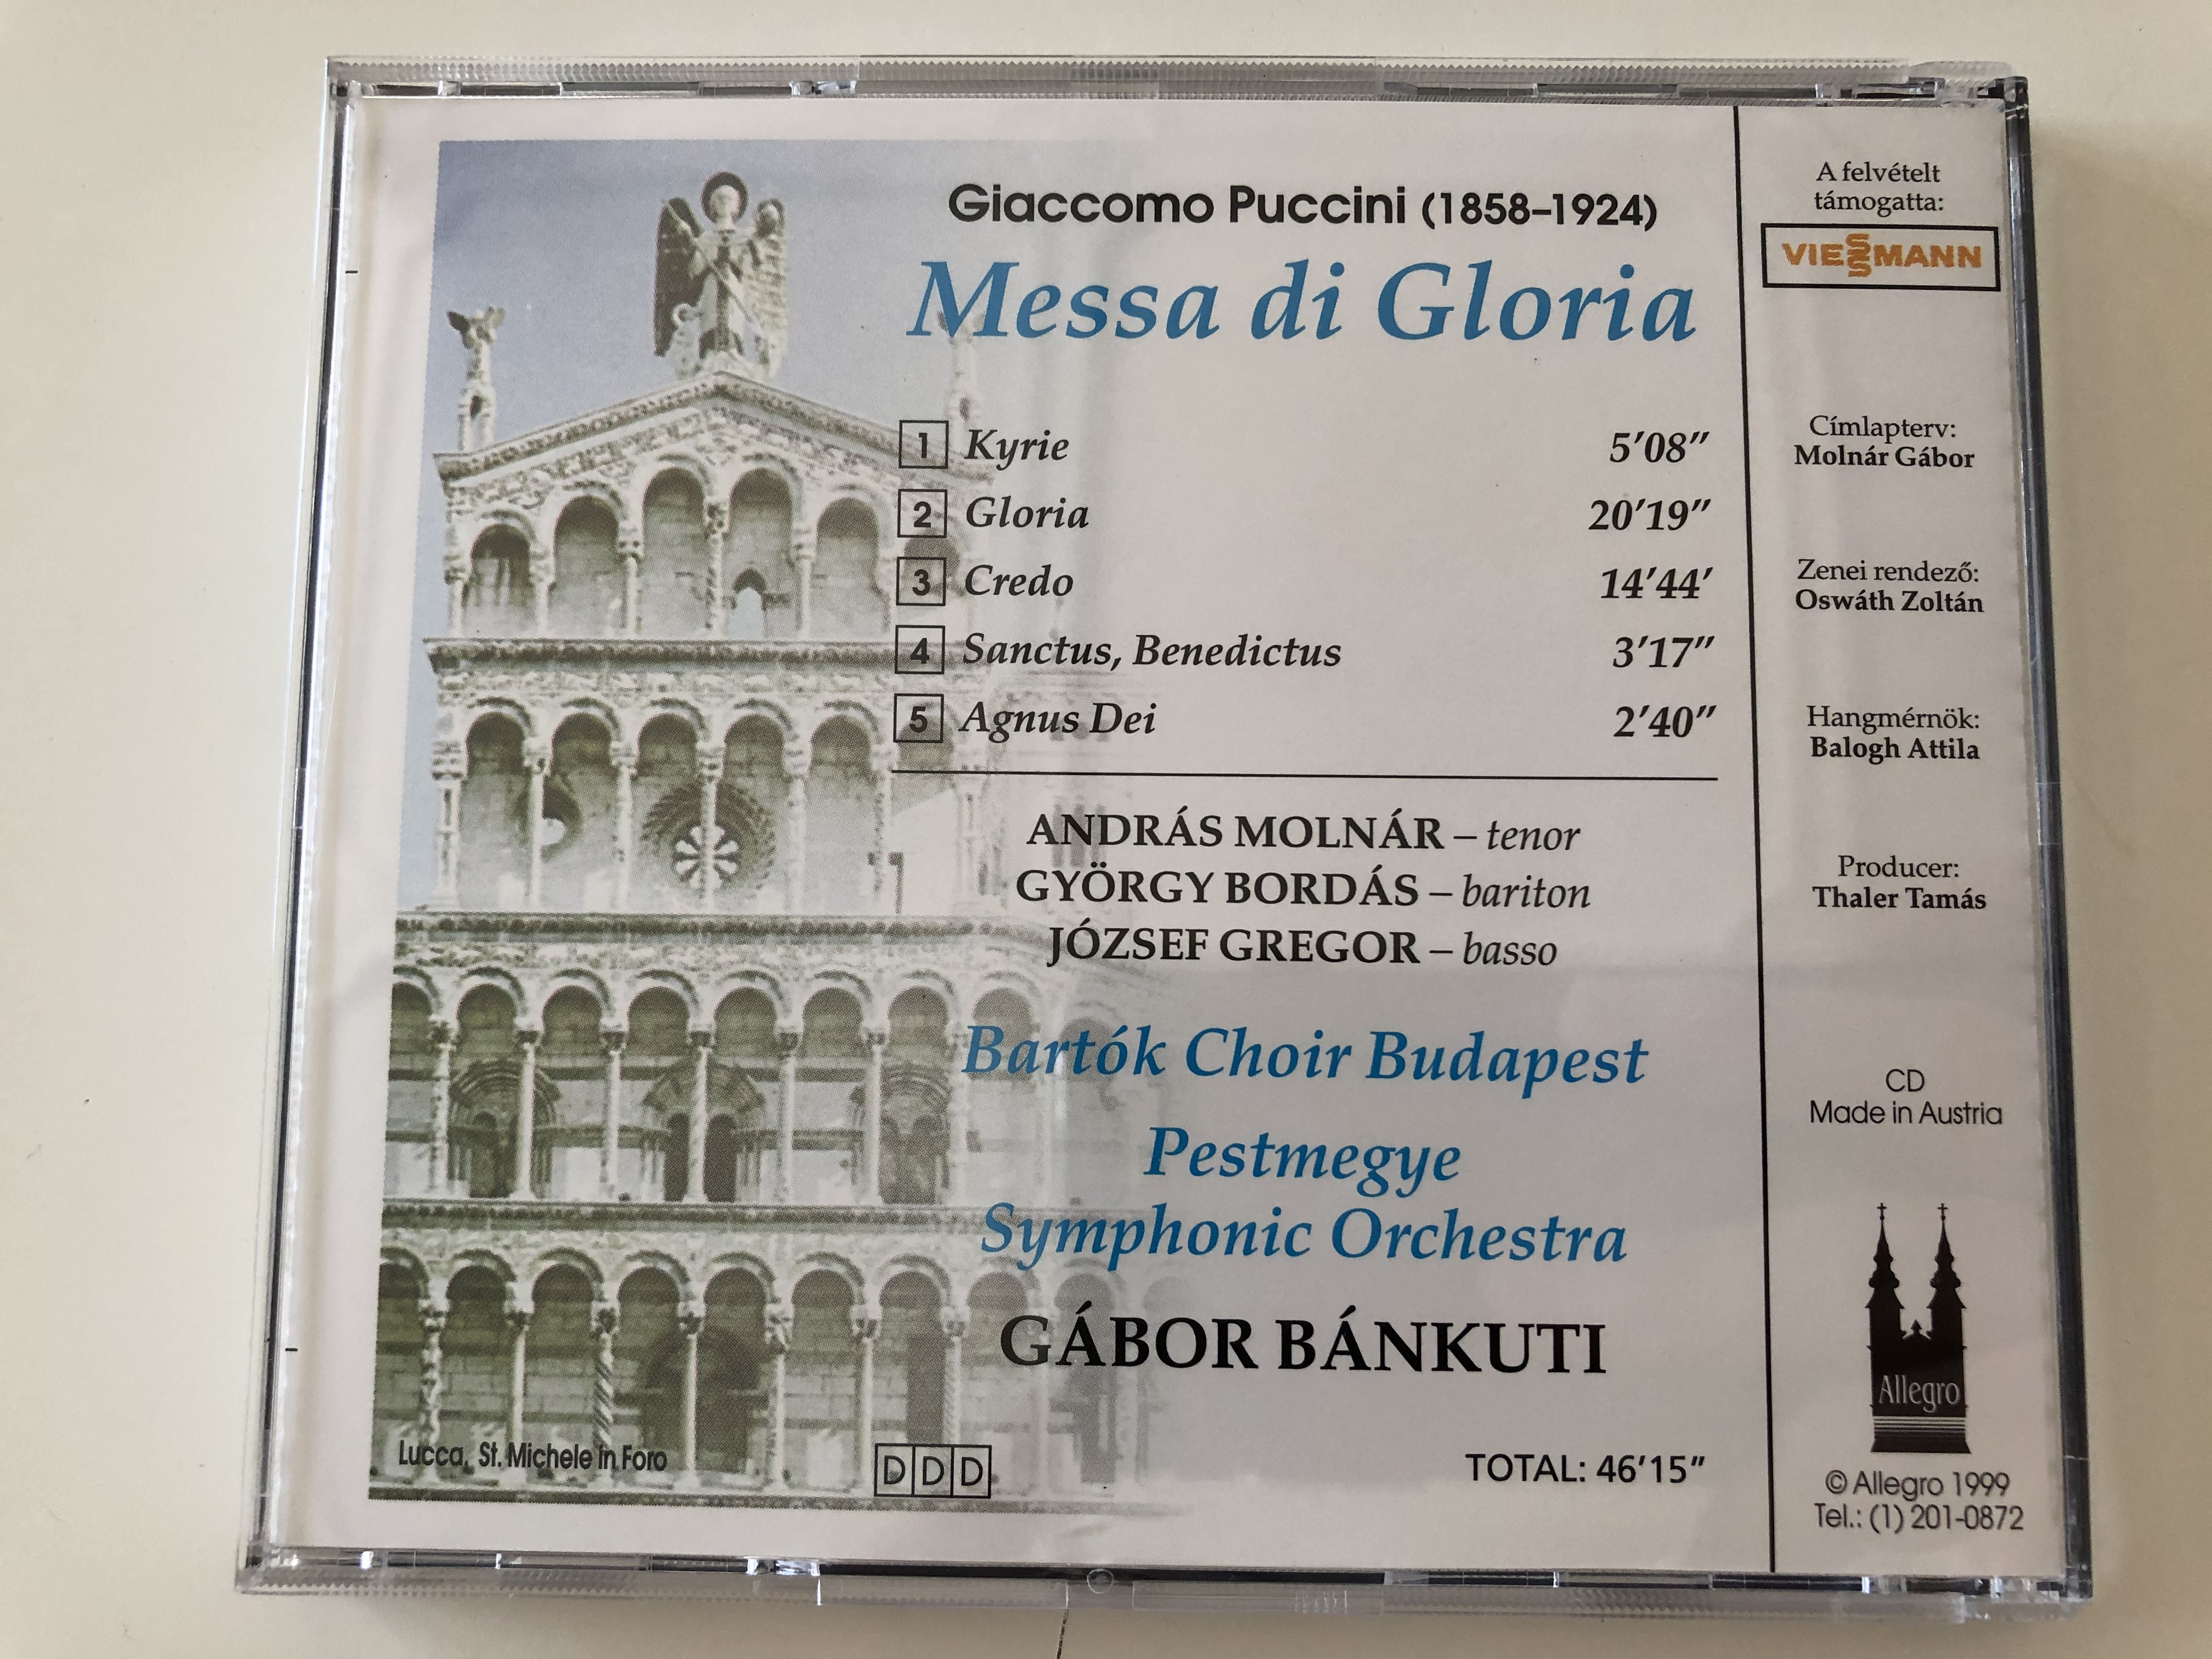 puccini-messa-di-gloria-andr-s-moln-r-gy-rgy-bord-s-jozsef-gregor-bart-k-choir-budapest-pestmegye-symphonic-orchestra-g-bor-b-nkuti-allegro-thaler-audio-cd-1999-mza-039-7-.jpg